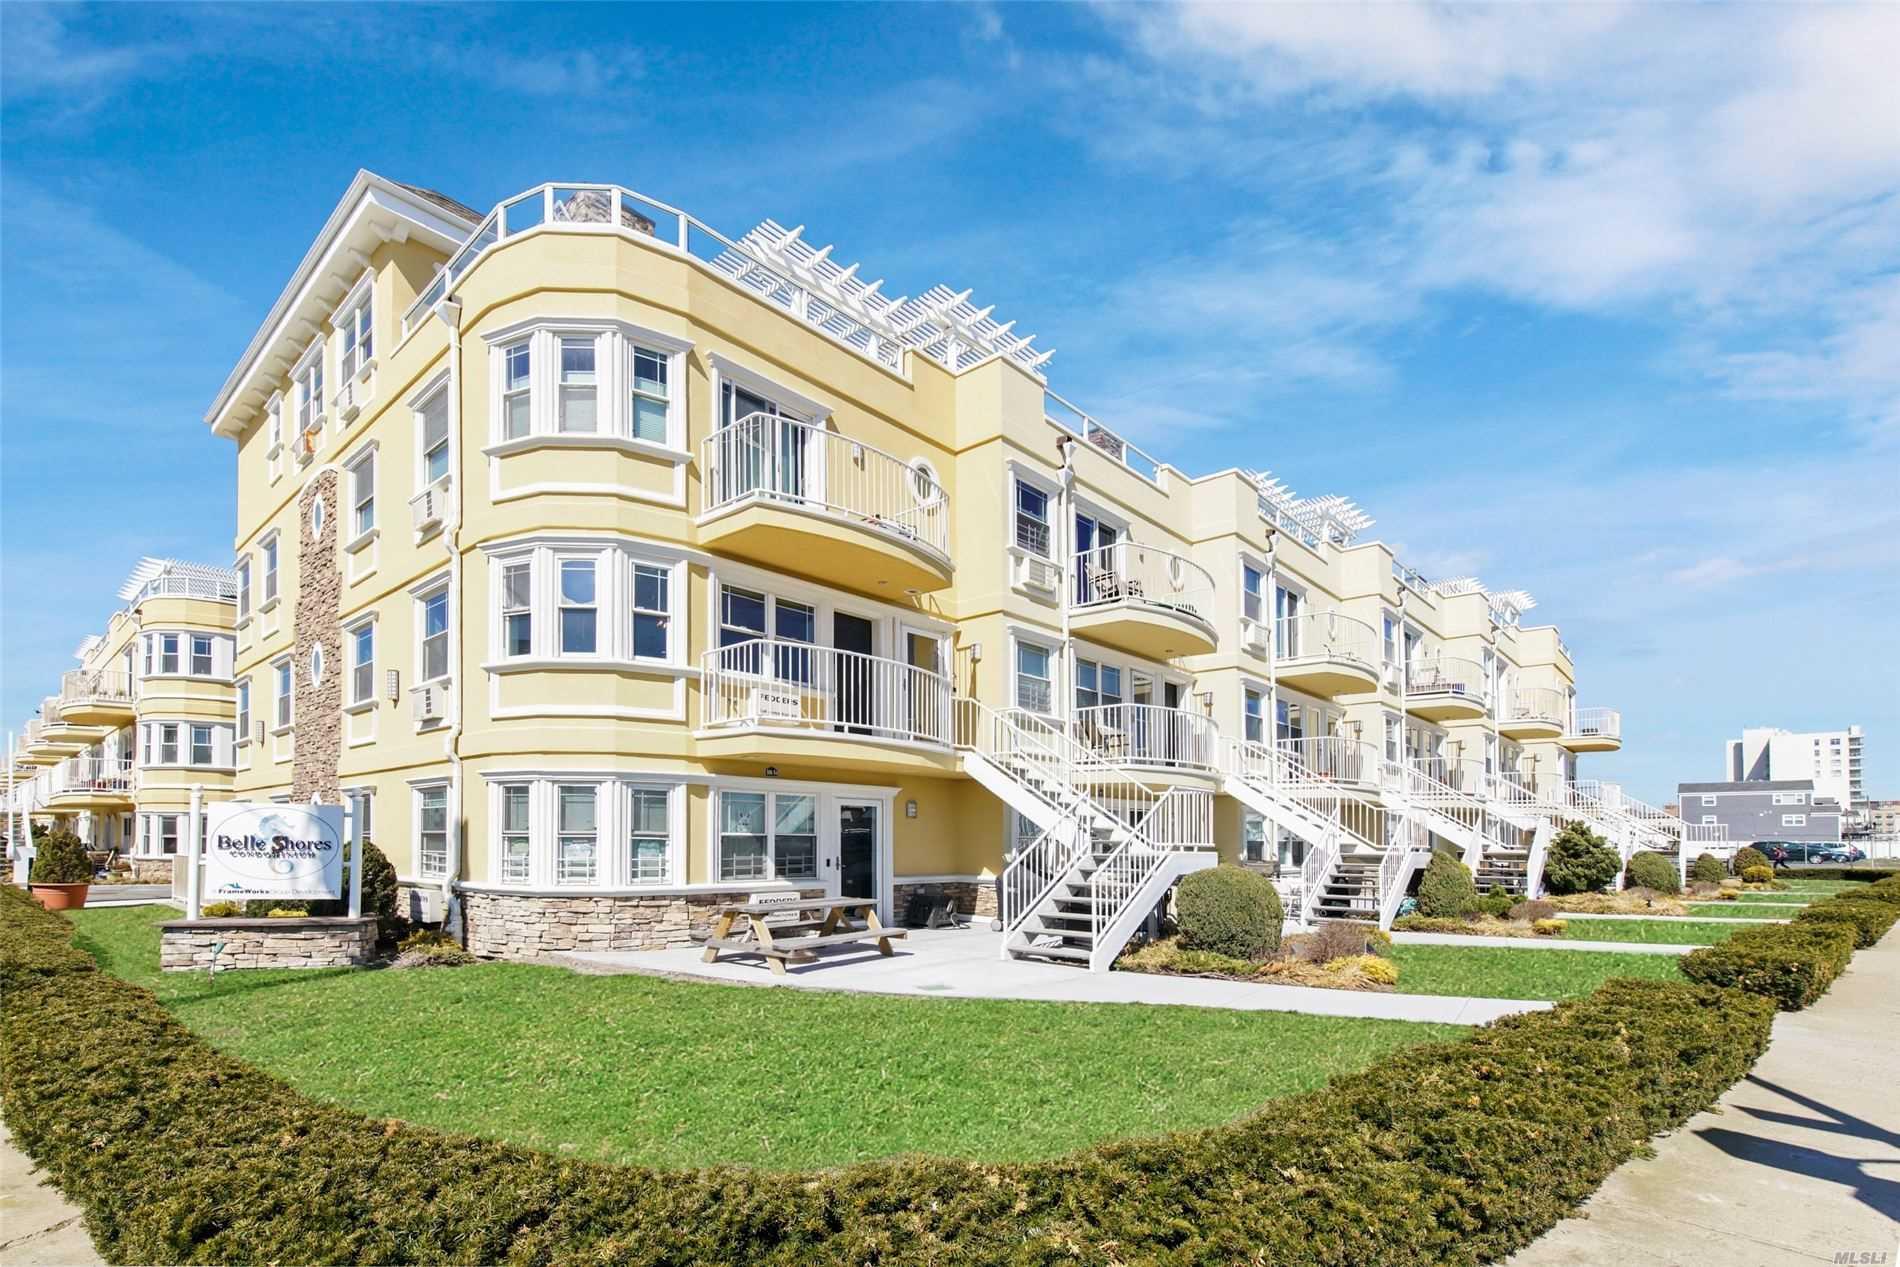 Property for sale at 100-04 Shorefront Parkway # 22A, Rockaway Park NY 11694, Rockaway Park,  New York 11694